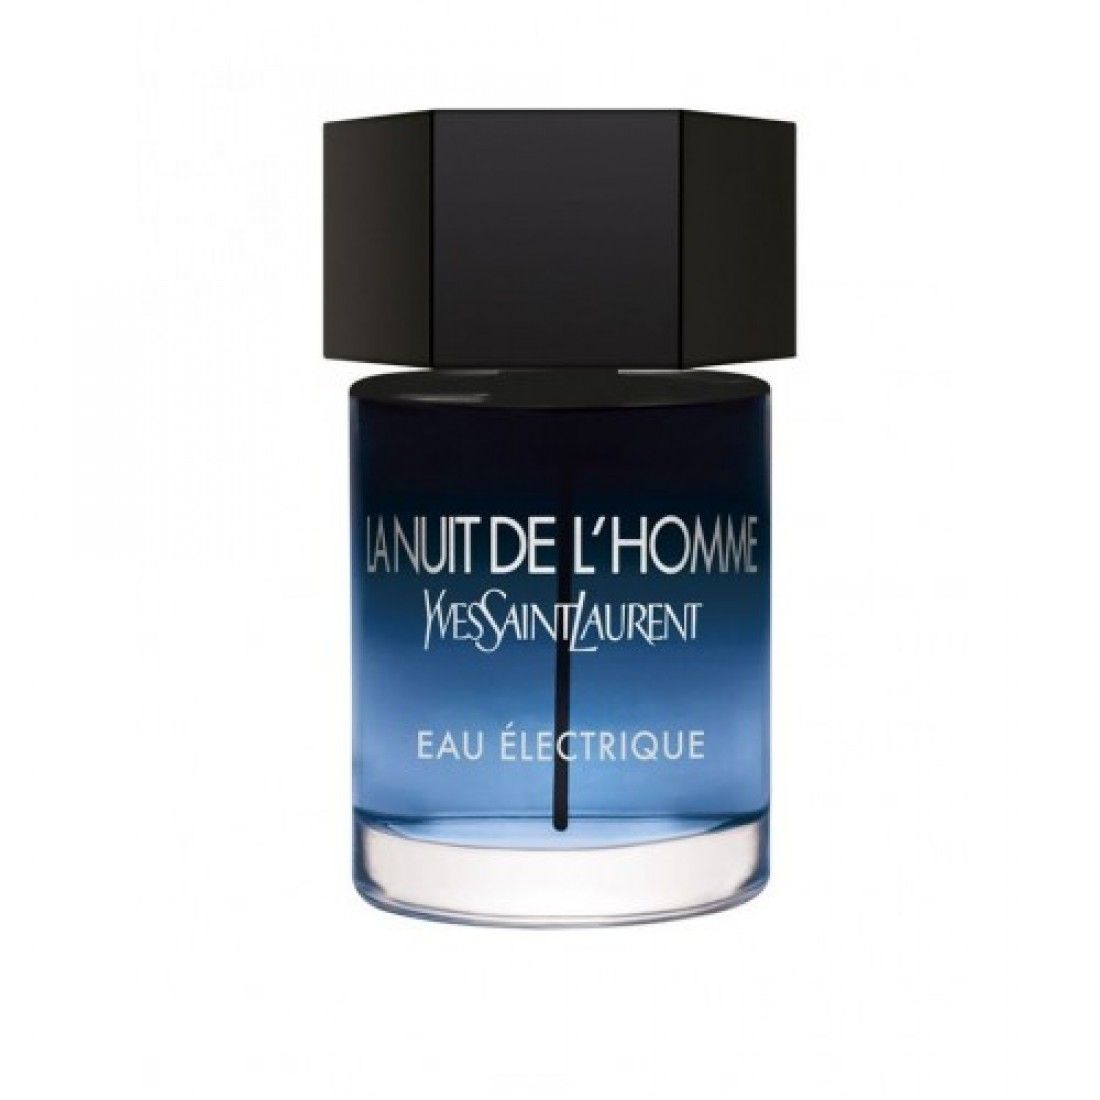 عطر ايف سان لوران لا نوي دي لوم ايو اليكتريك او دو تواليت 100مل Perfume Bottles Perfume Bottle